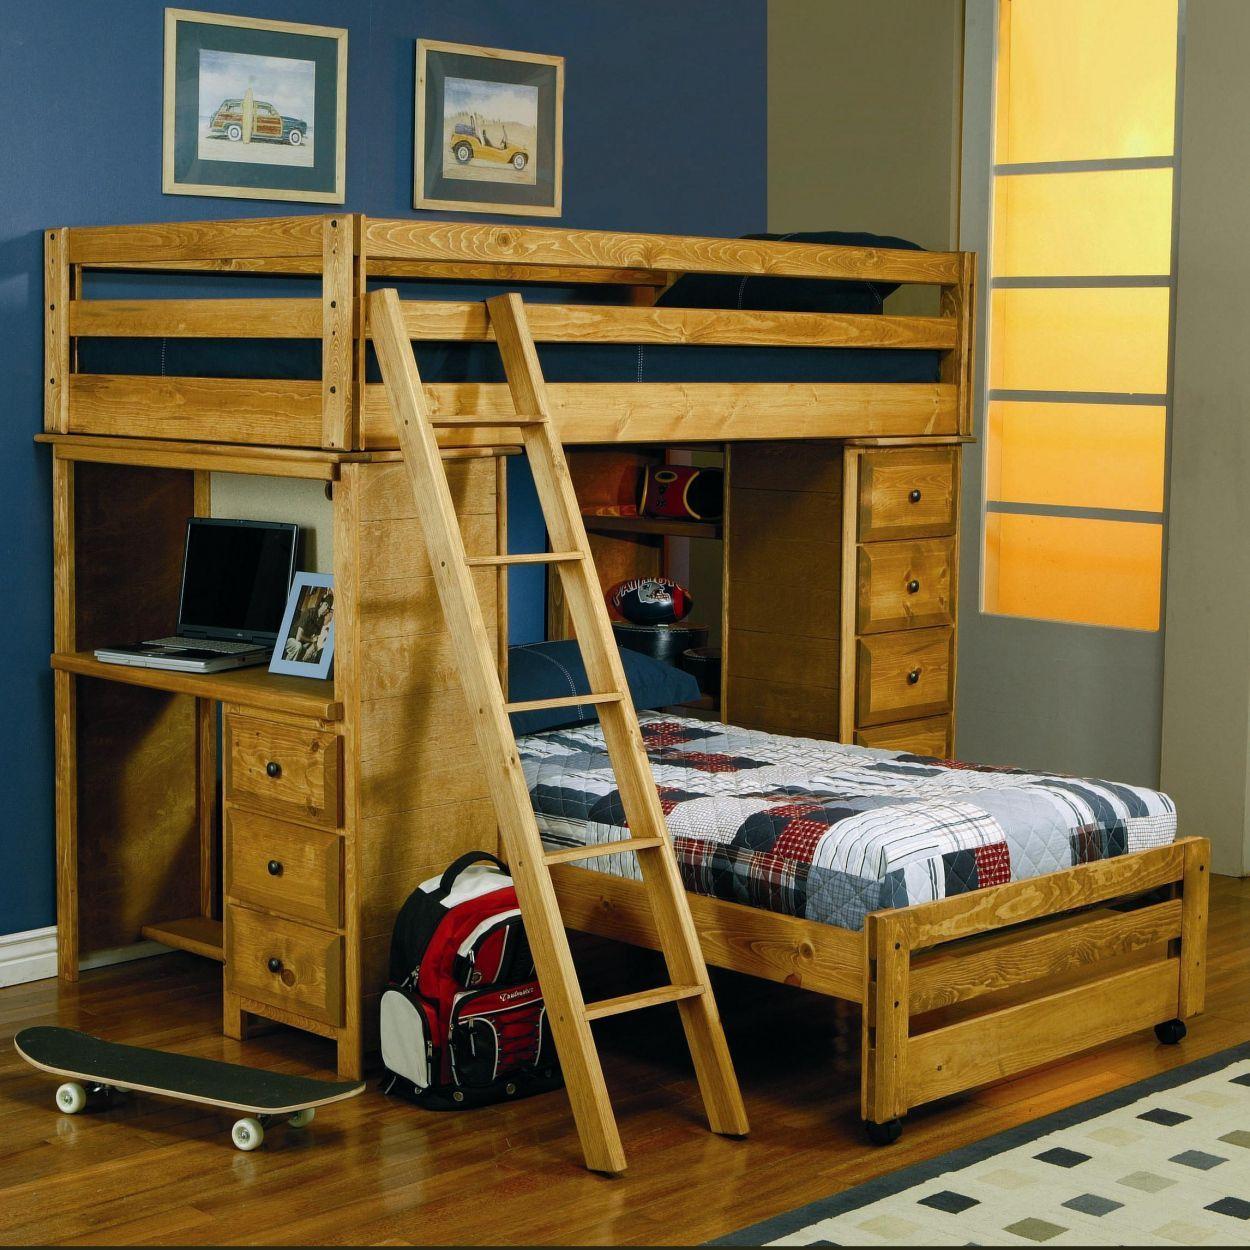 20 Cargo Furniture Bunk Bed Bedroom Interior Decorating Check